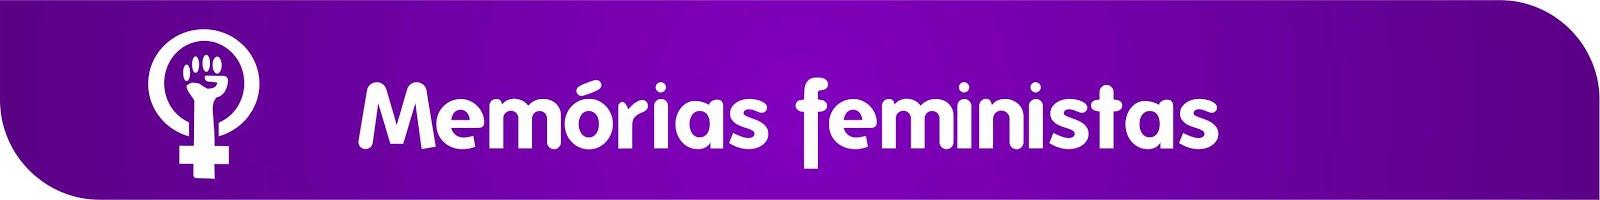 Memória feminista